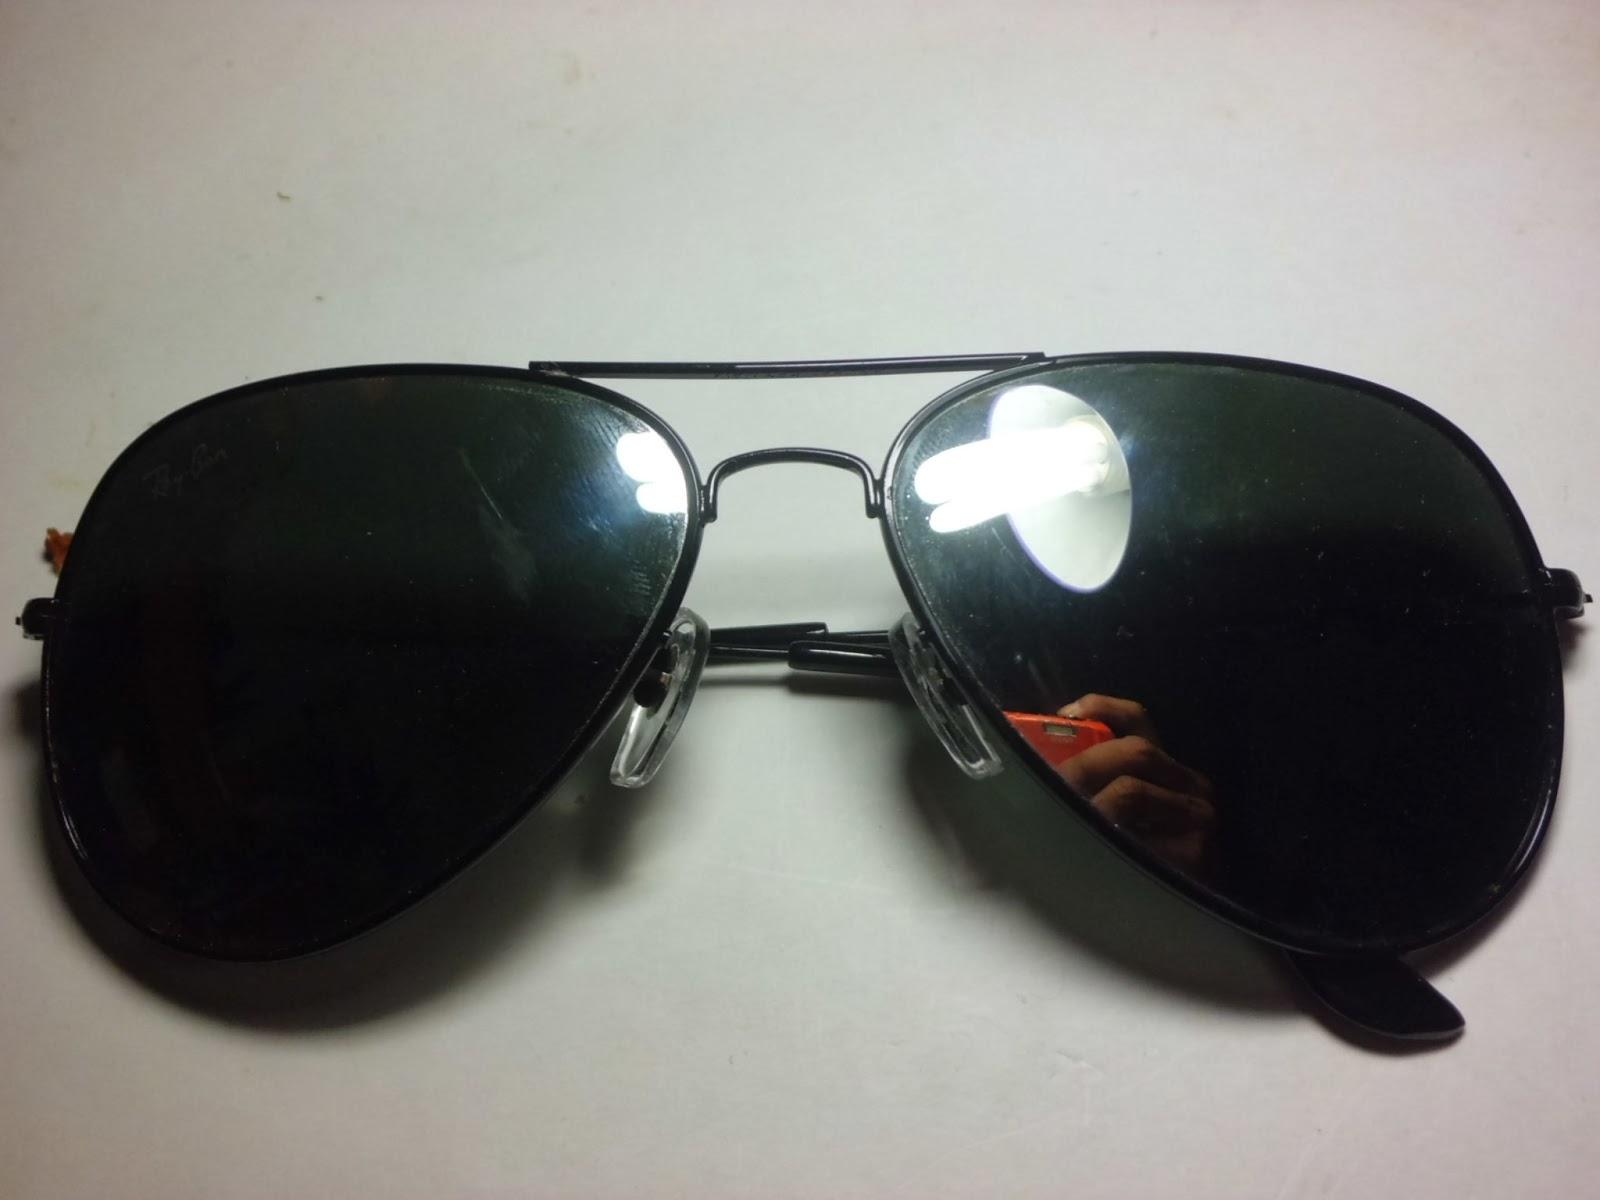 ... usa kacamata rayban rb 3026 black frame mirror lens harga rp 600.000  9ca01 8afd3 ... 8161dc60f8